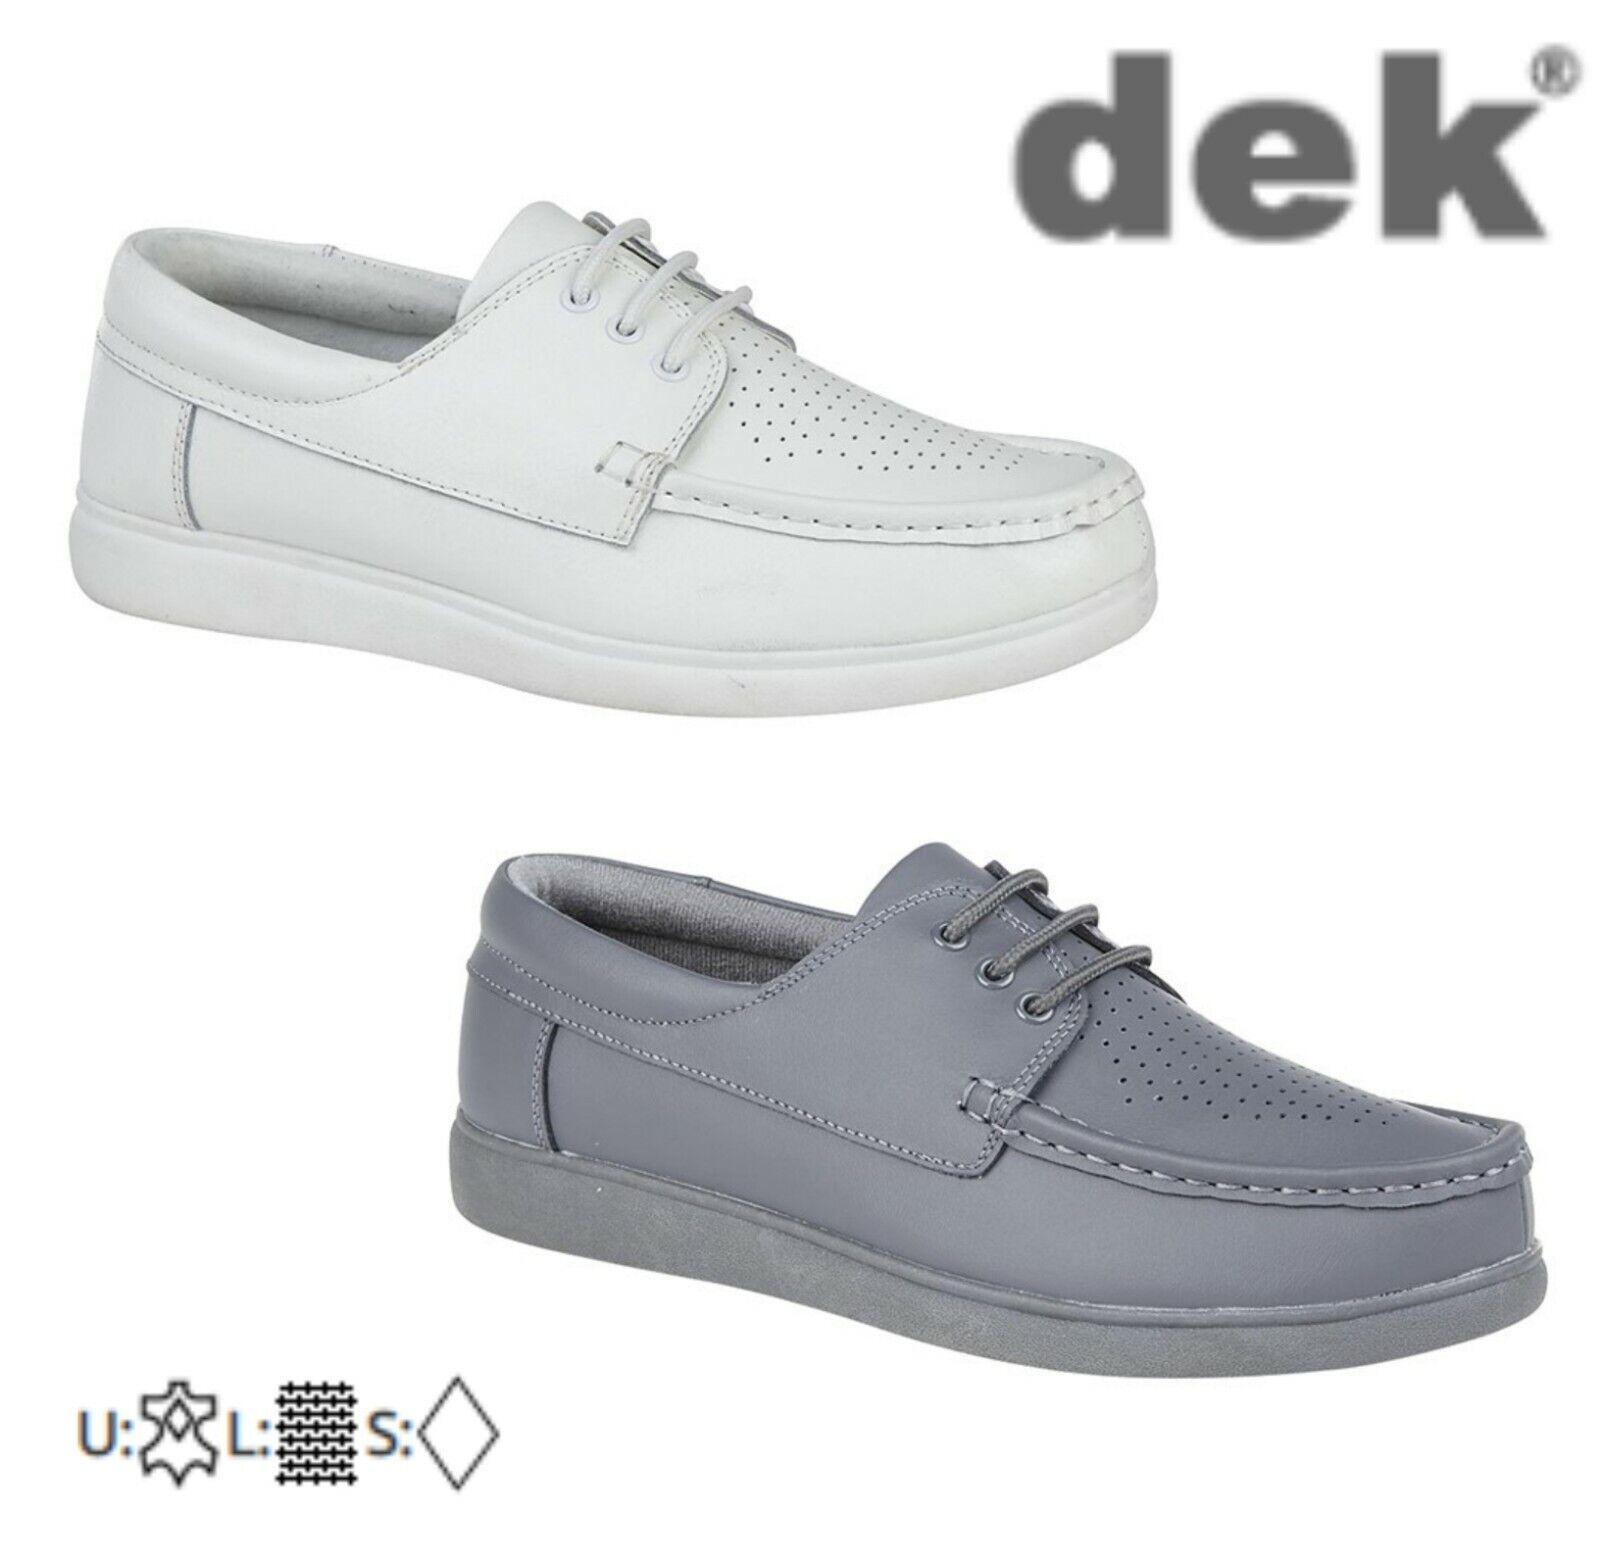 Bowls - Unisex Leather Lace Up Bowling shoes White Grey Size 5 6 7 8 9 10 11 12